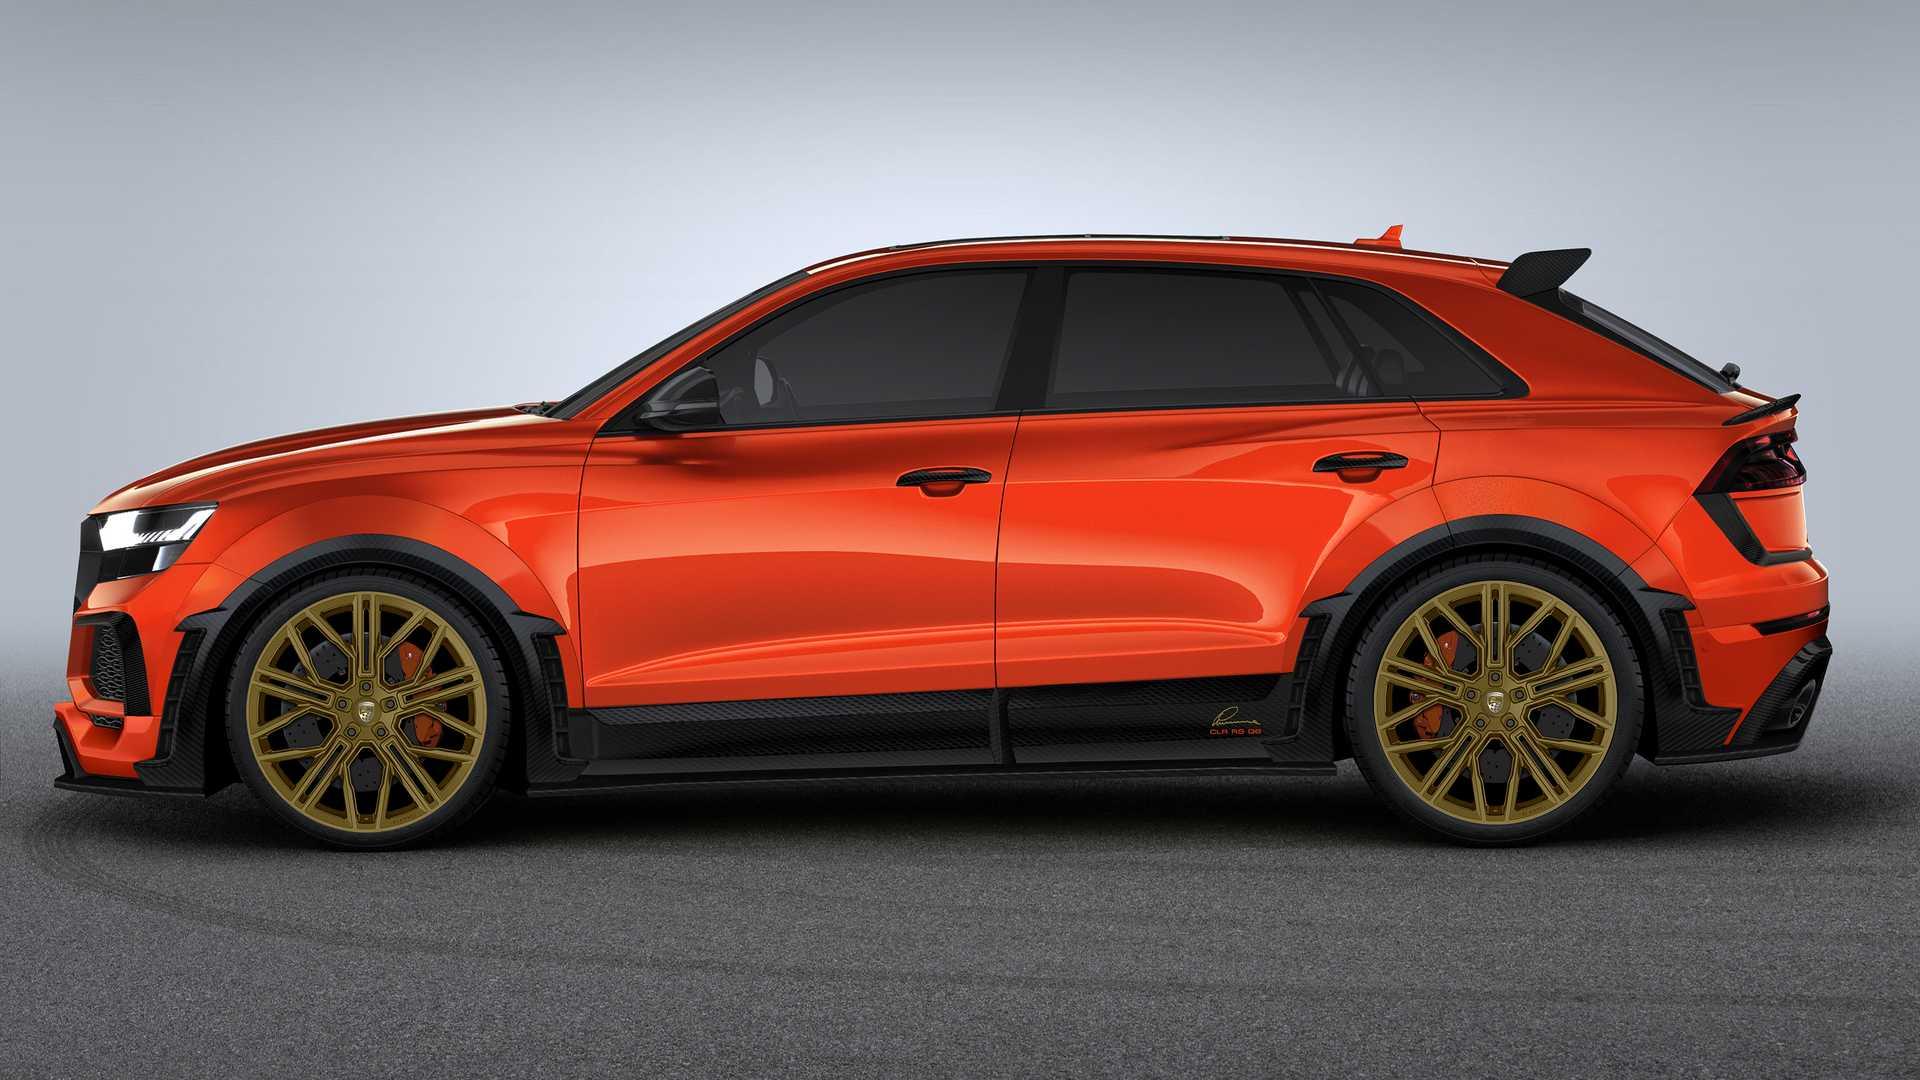 Audi-RS-Q8-CLR-8-RS-By-Lumma-Design-9